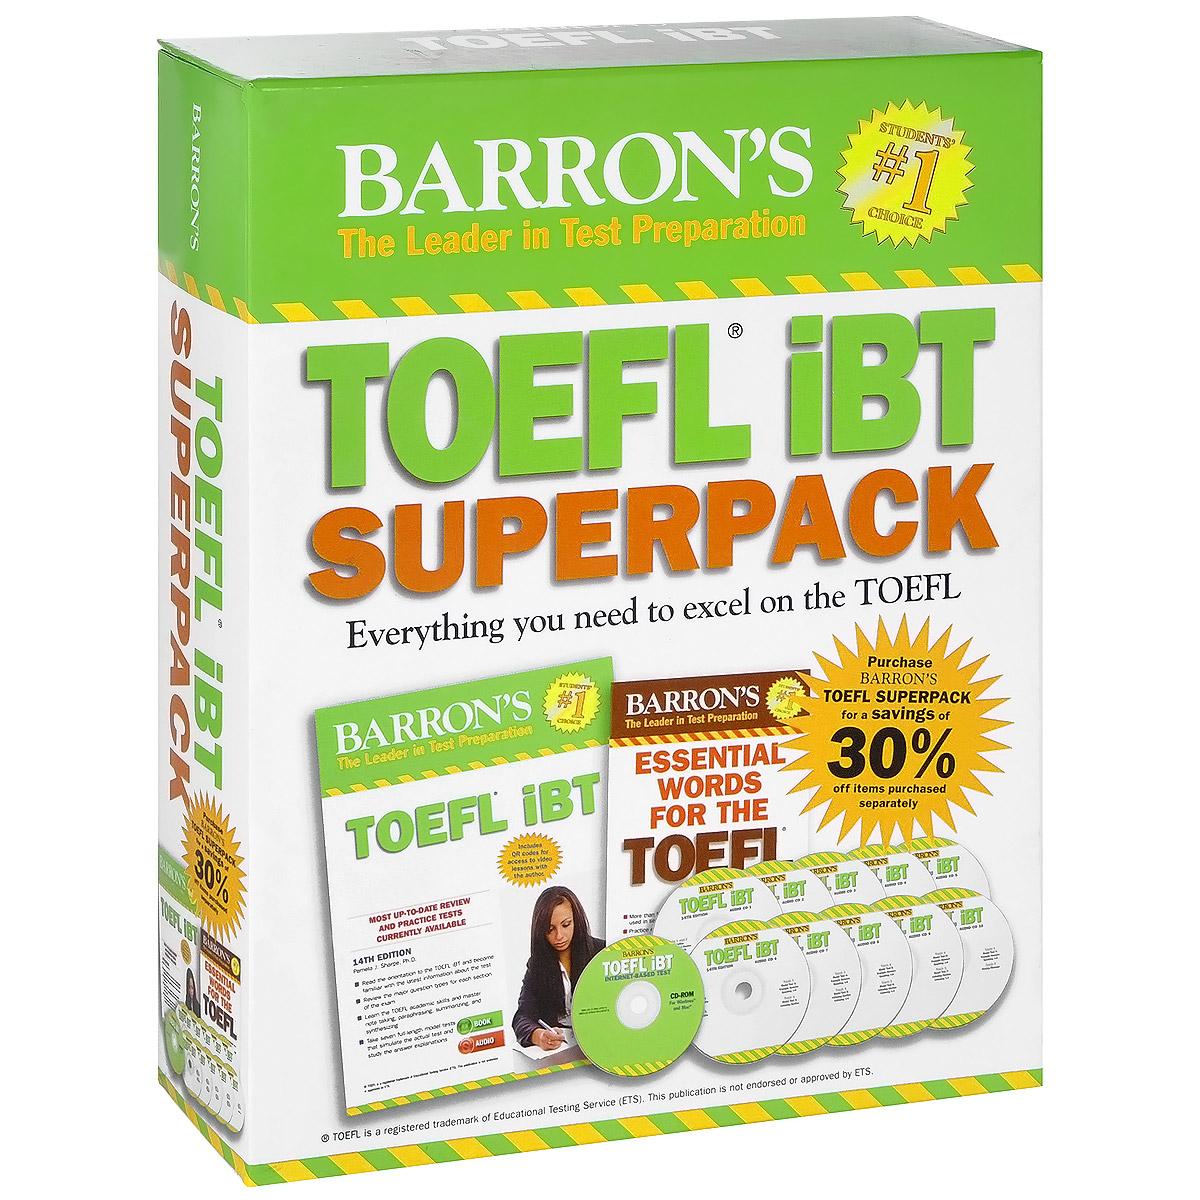 Barron's TOEFL iBT Superpack (комплект из 2 книг + 11 CD-ROM) pamela j sharpe stephen j matthiesen toefl ibt superpack